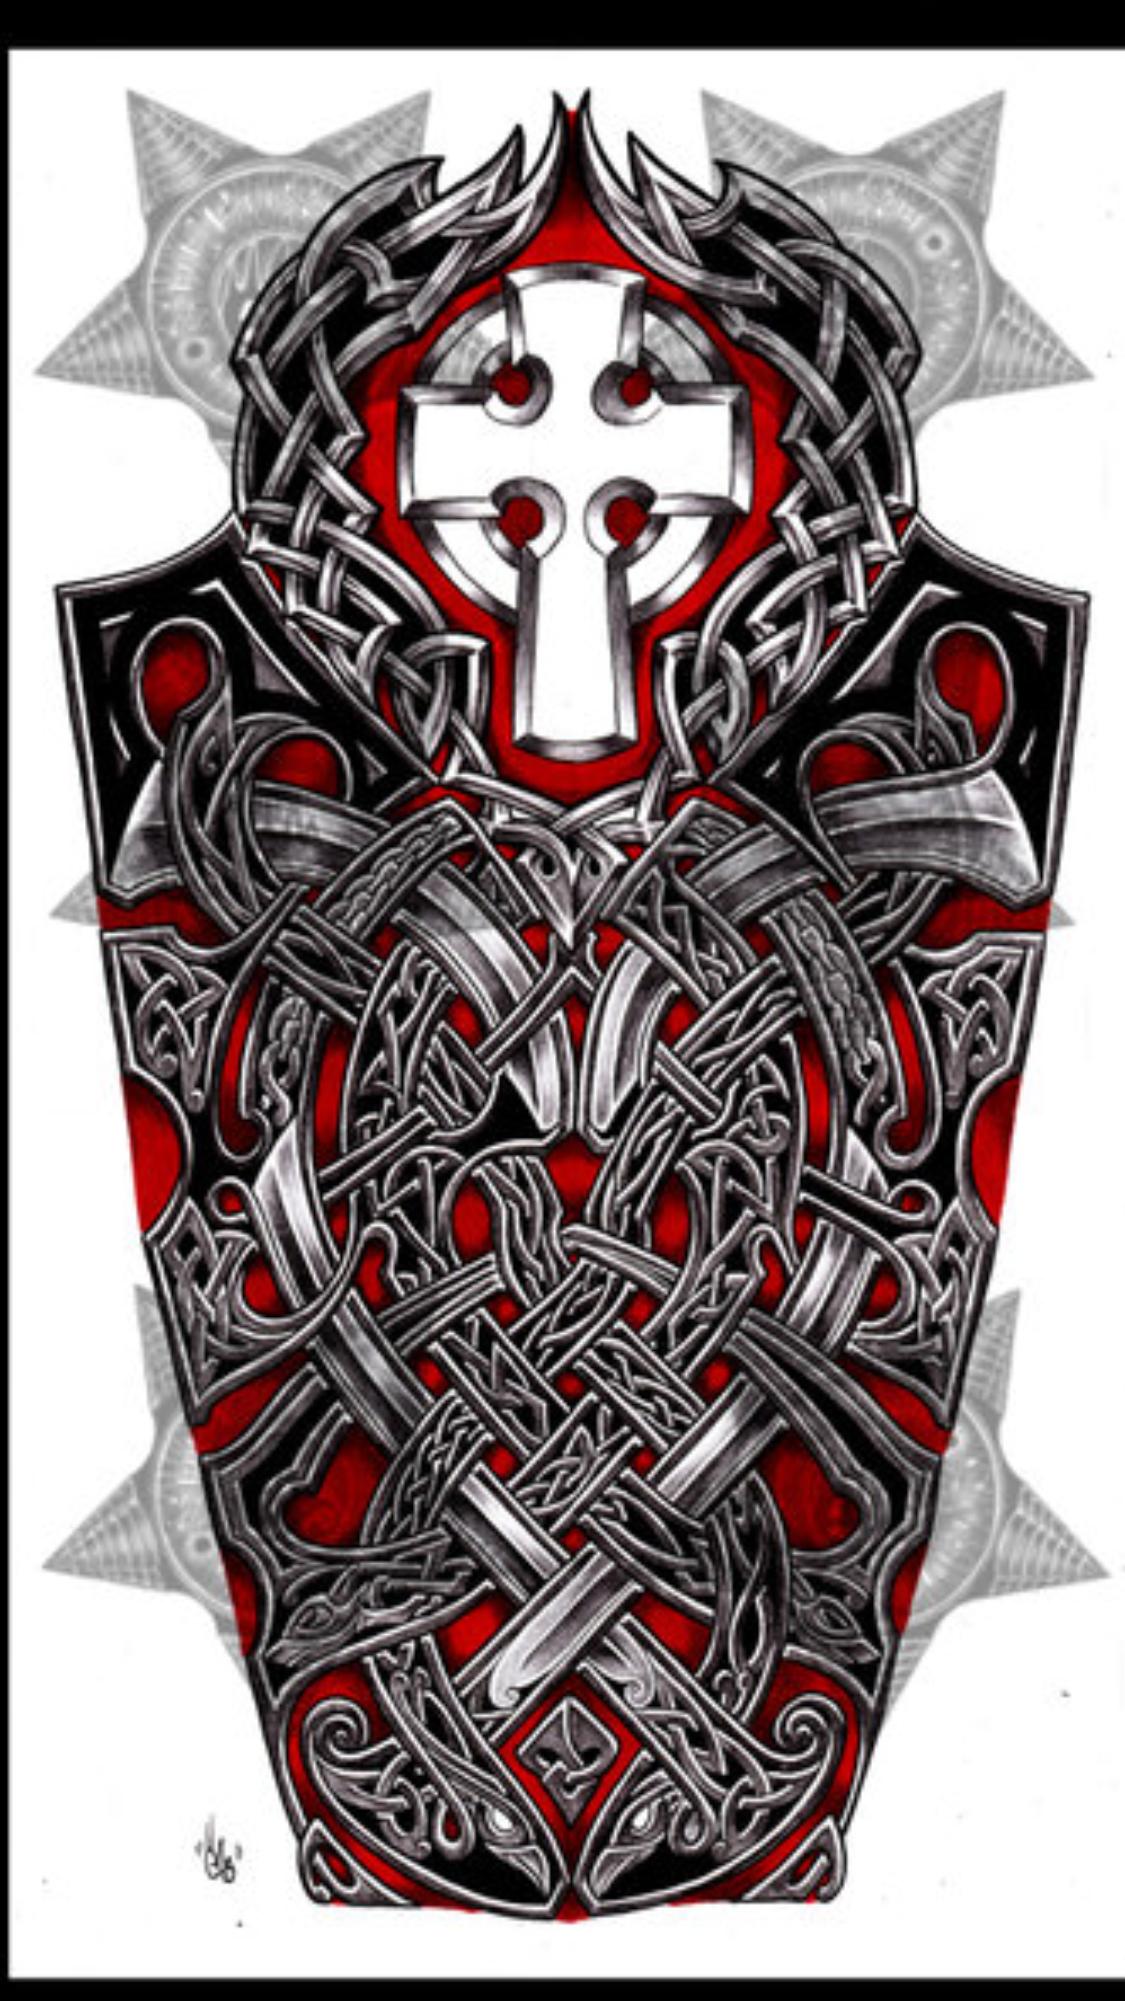 Wolf S Cross Viking Pagan Tatuagem Masculina Tatuagem